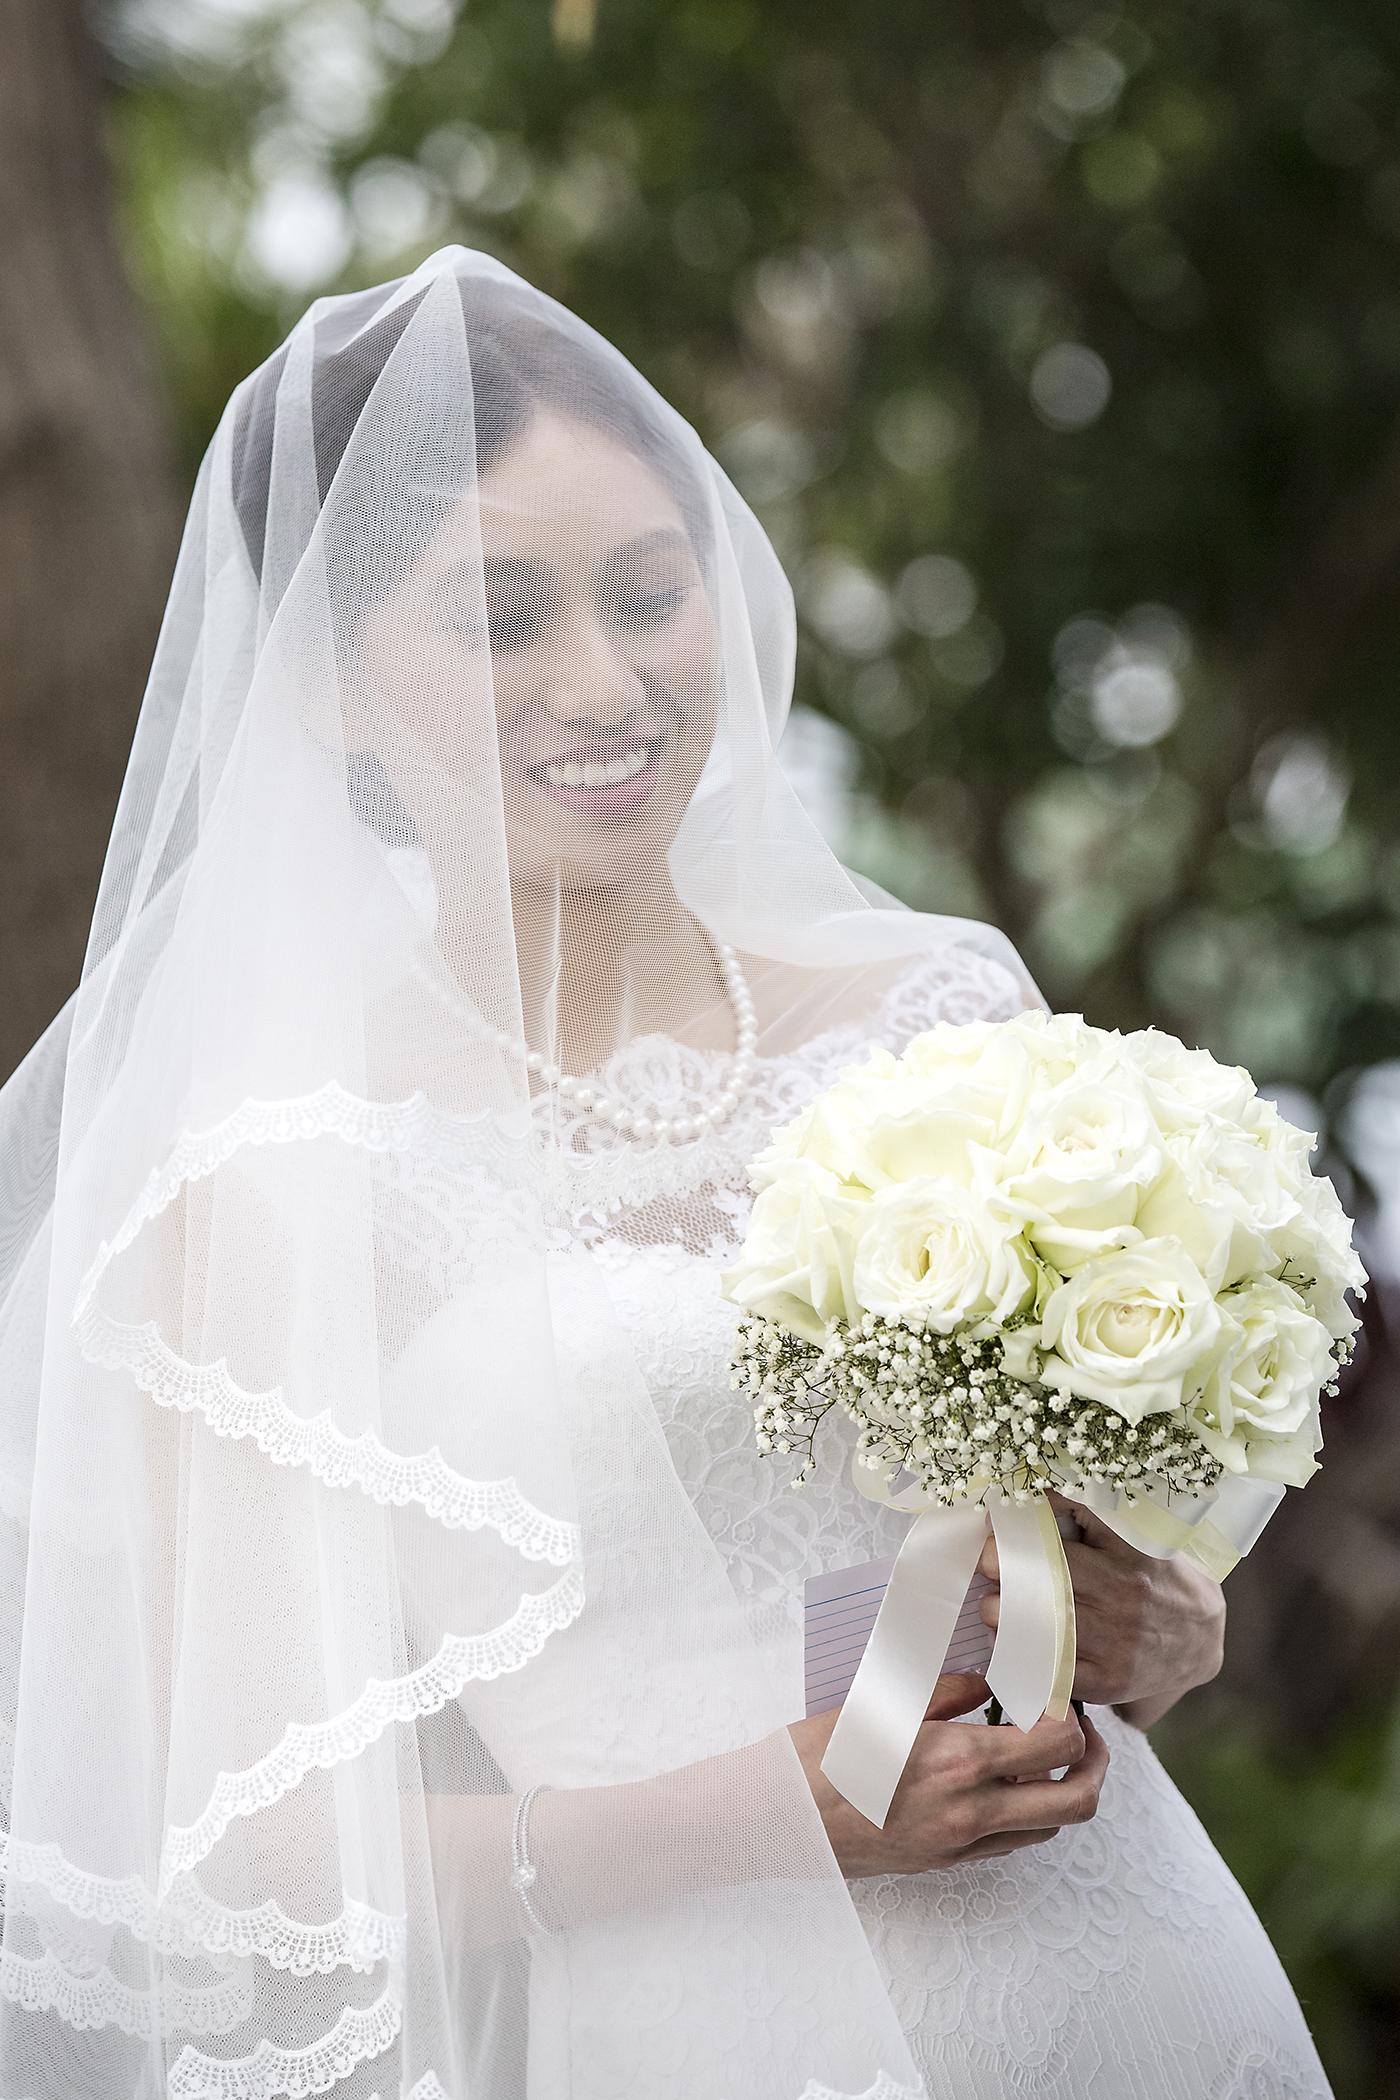 moe-keith-wedding-3.jpg